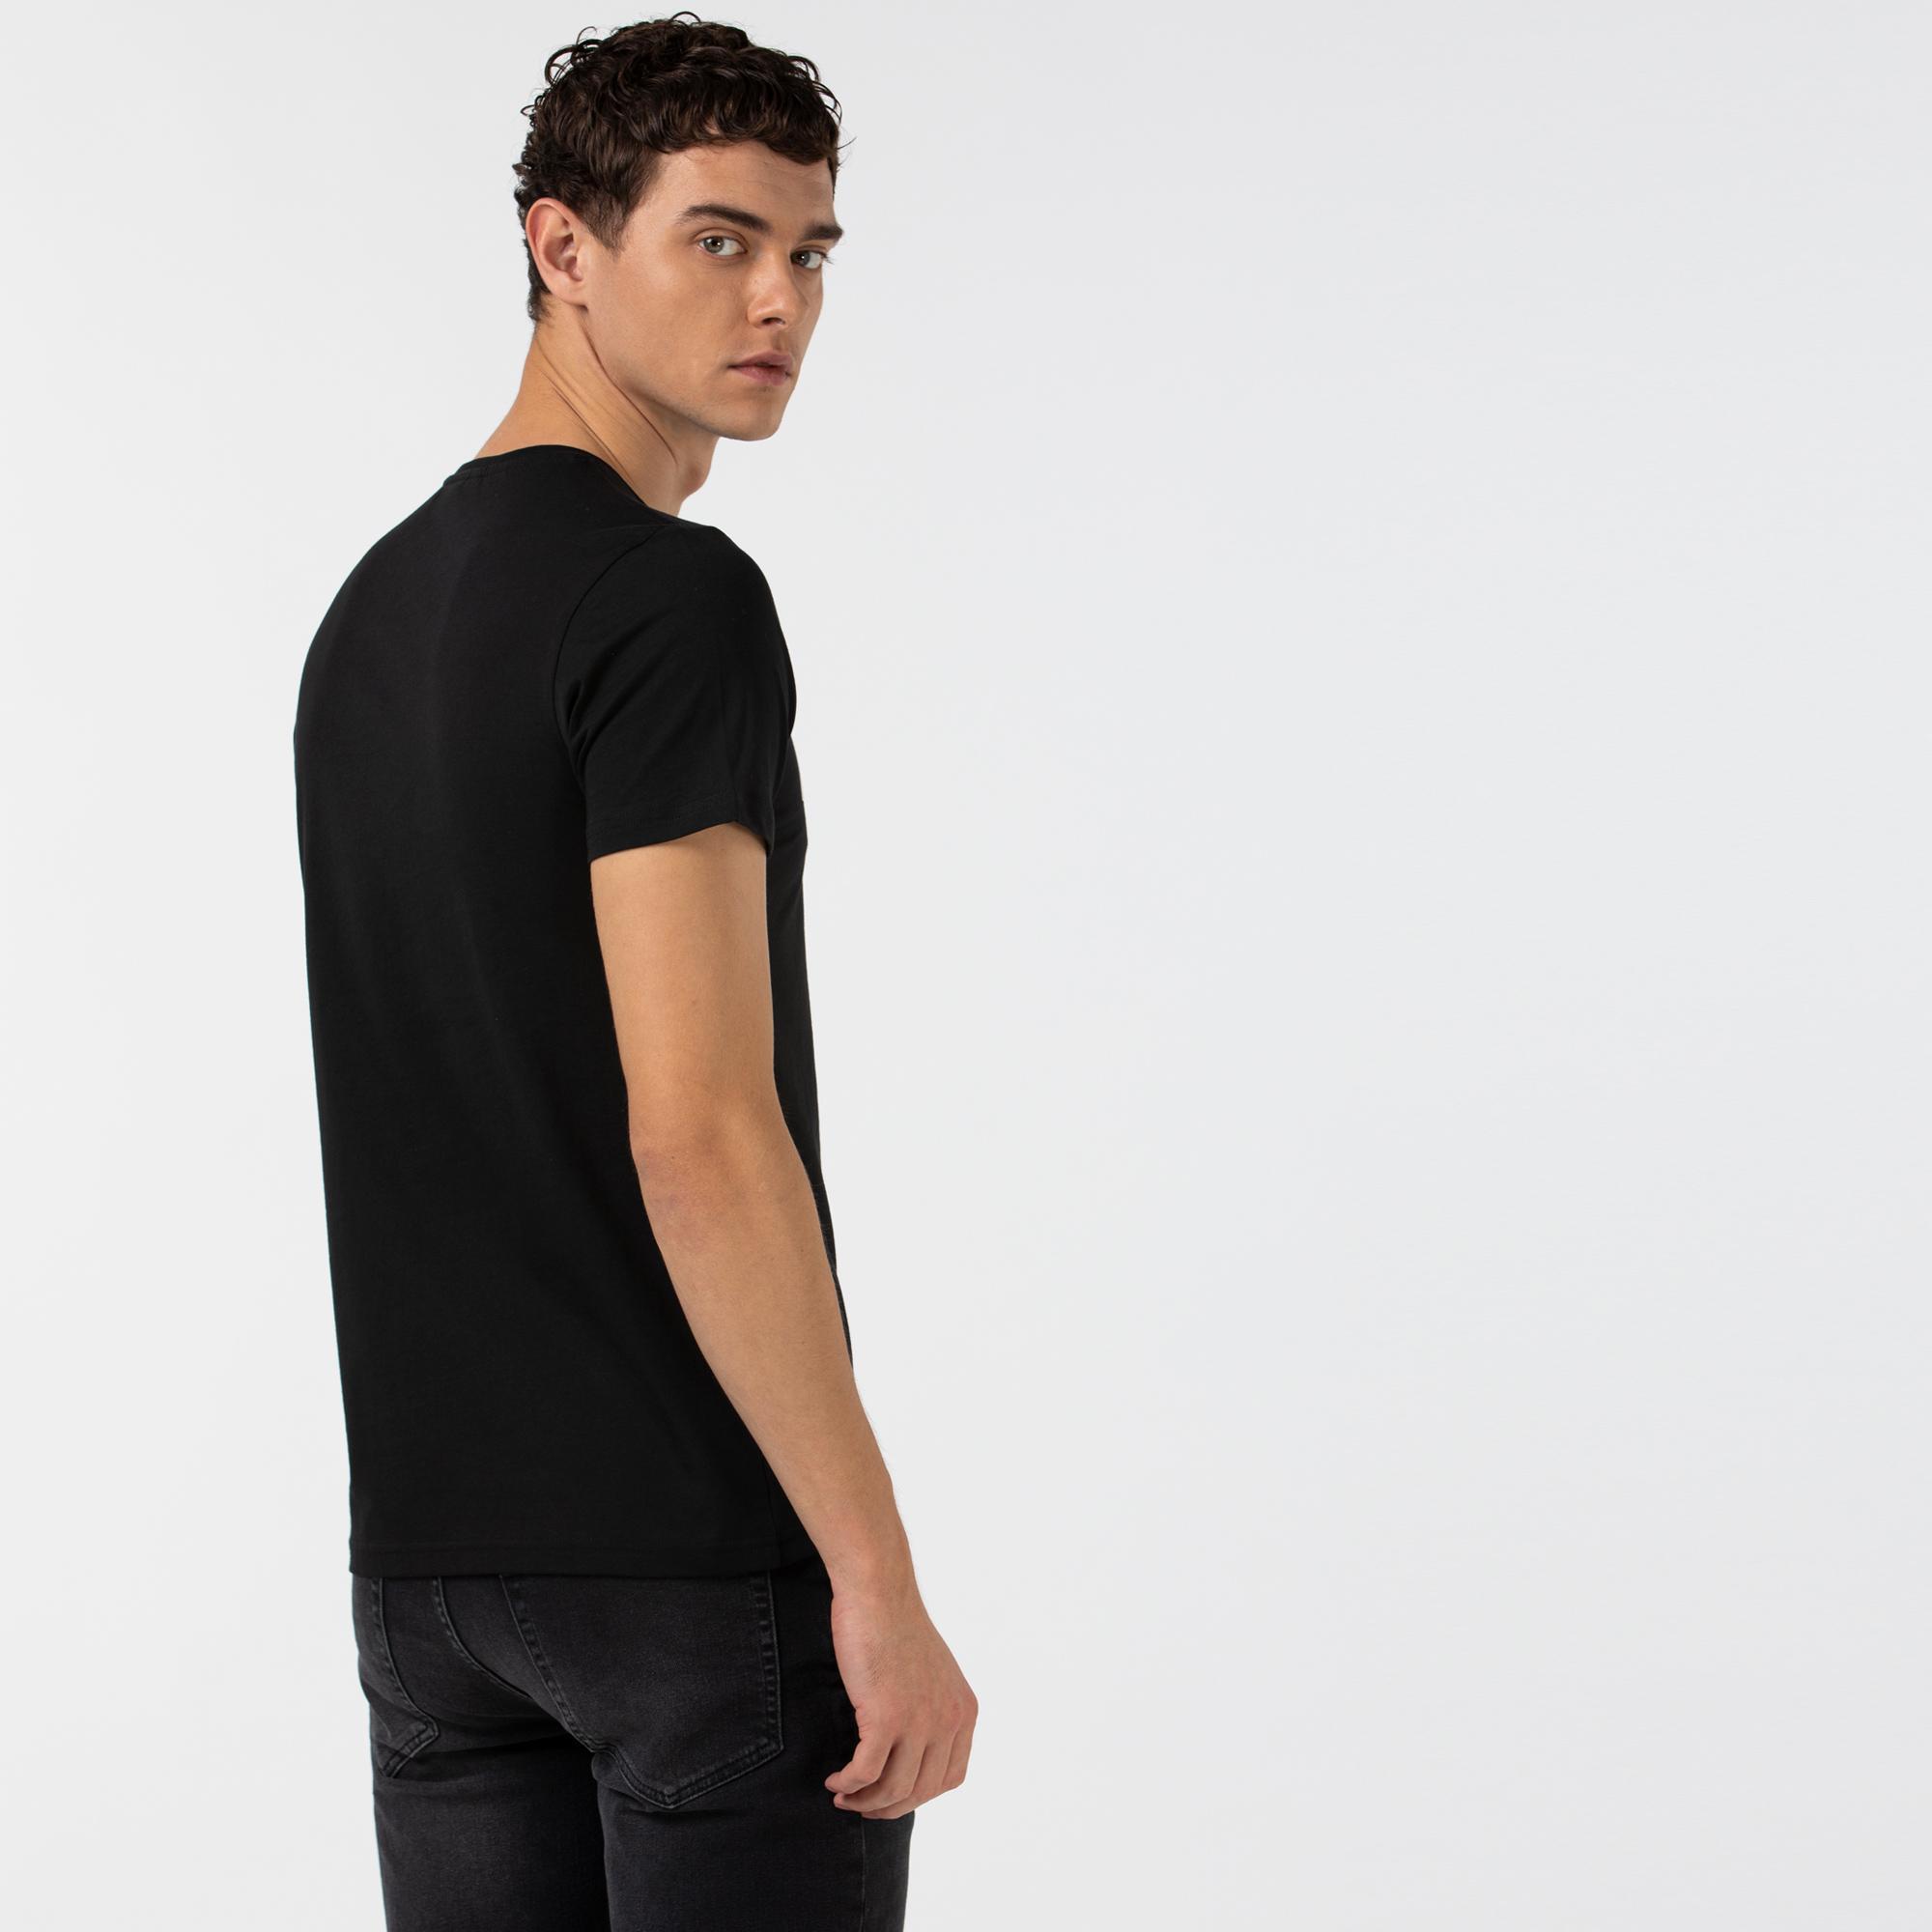 Lacoste Erkek Baskılı Bisiklet Yaka Siyah T-Shirt